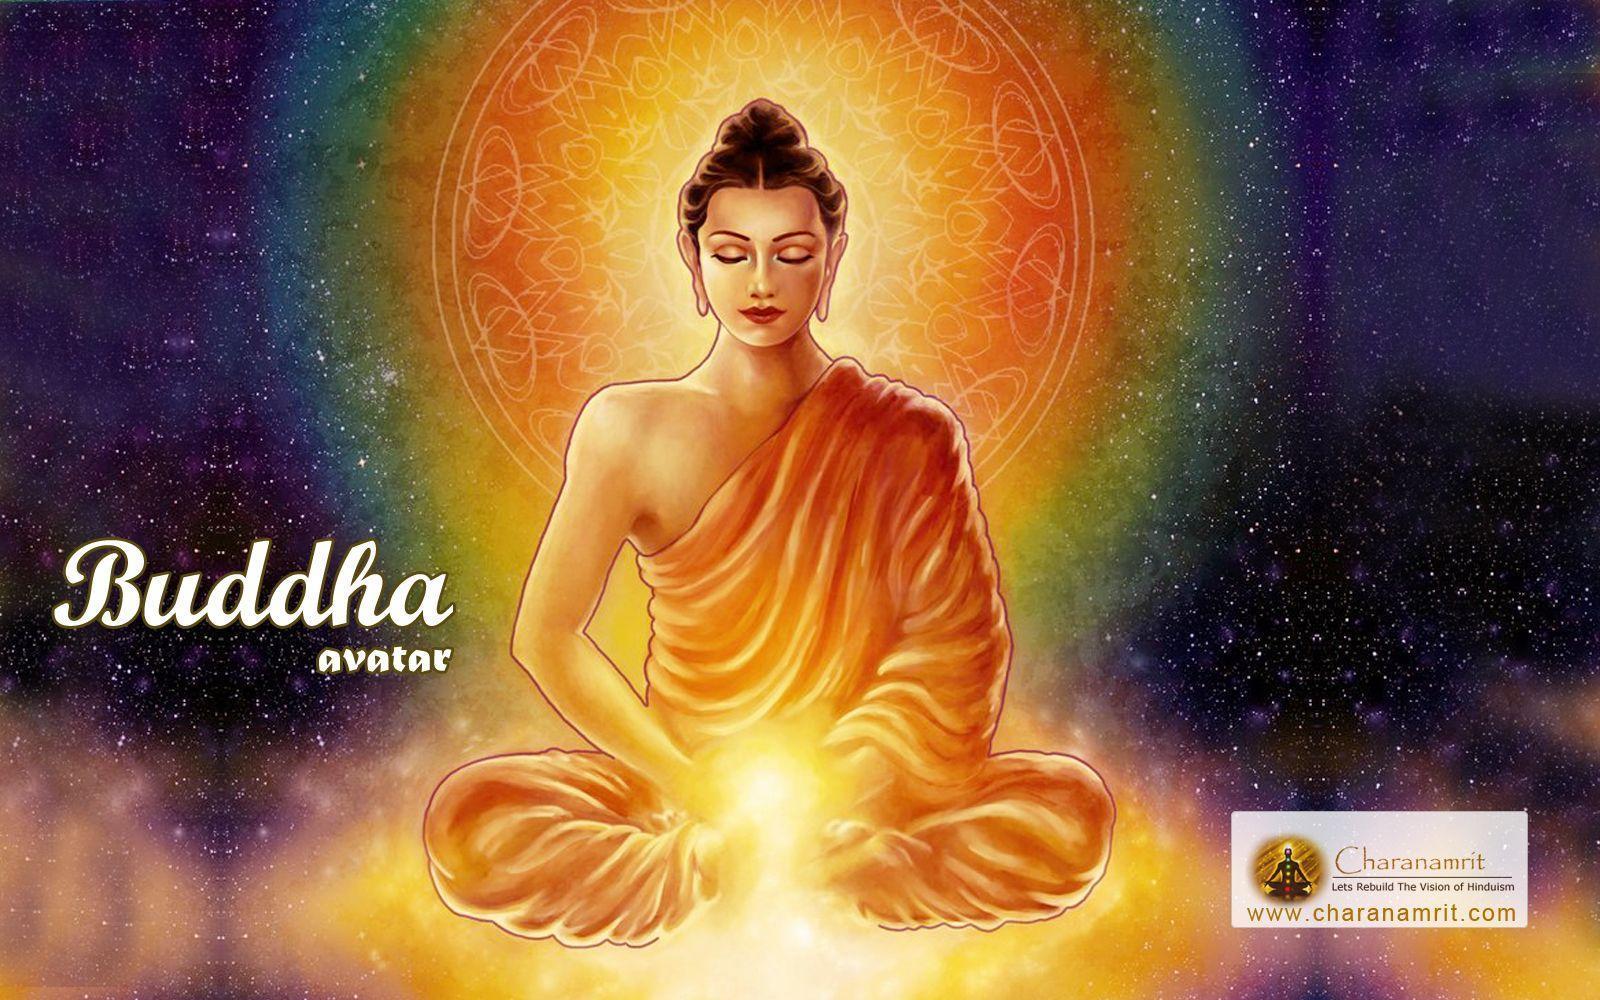 Gautama Buddha Wallpapers - Wallpaper Cave